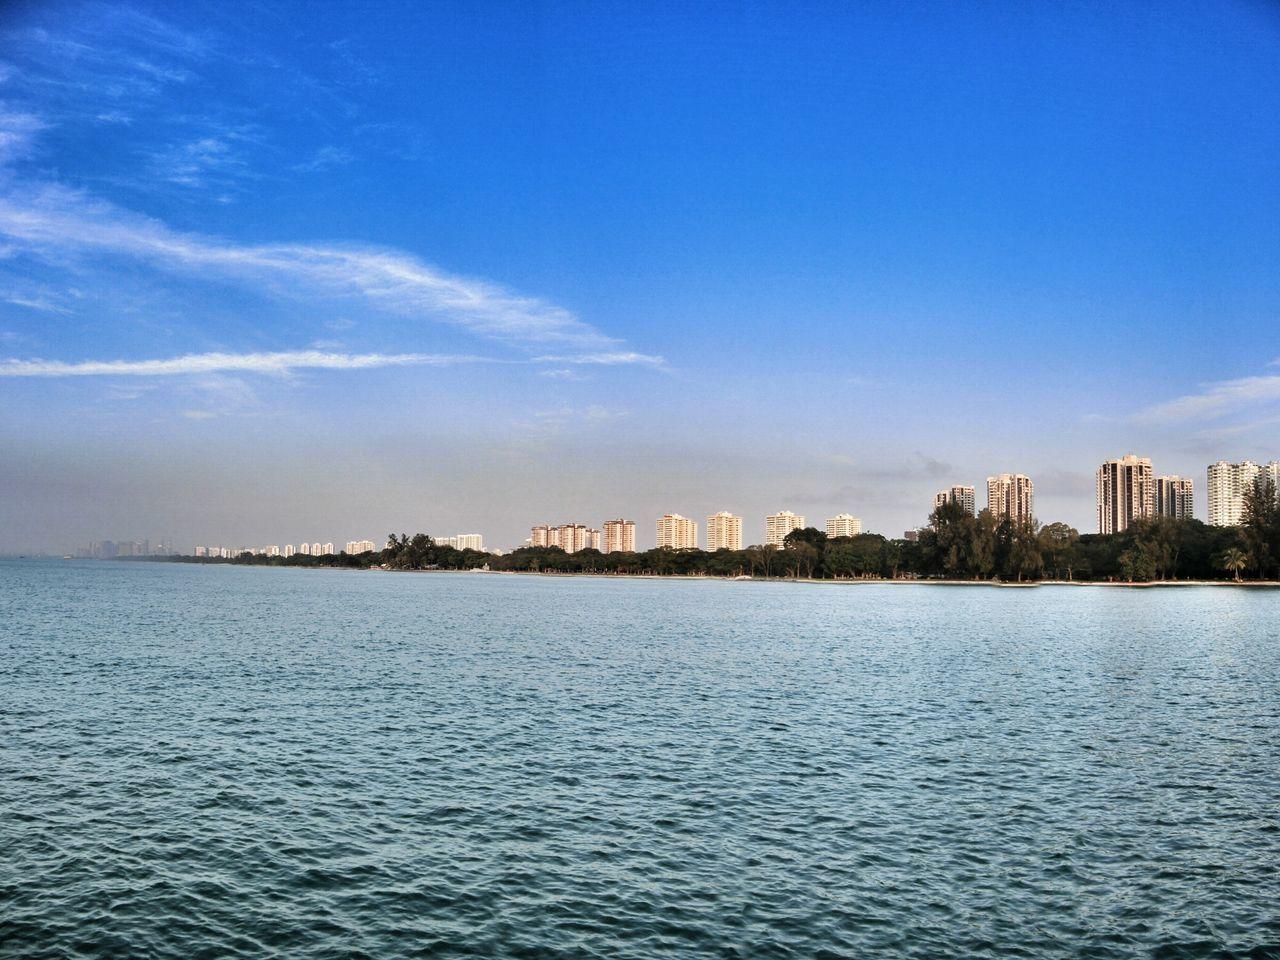 Waterfront Buildings Along Coastline